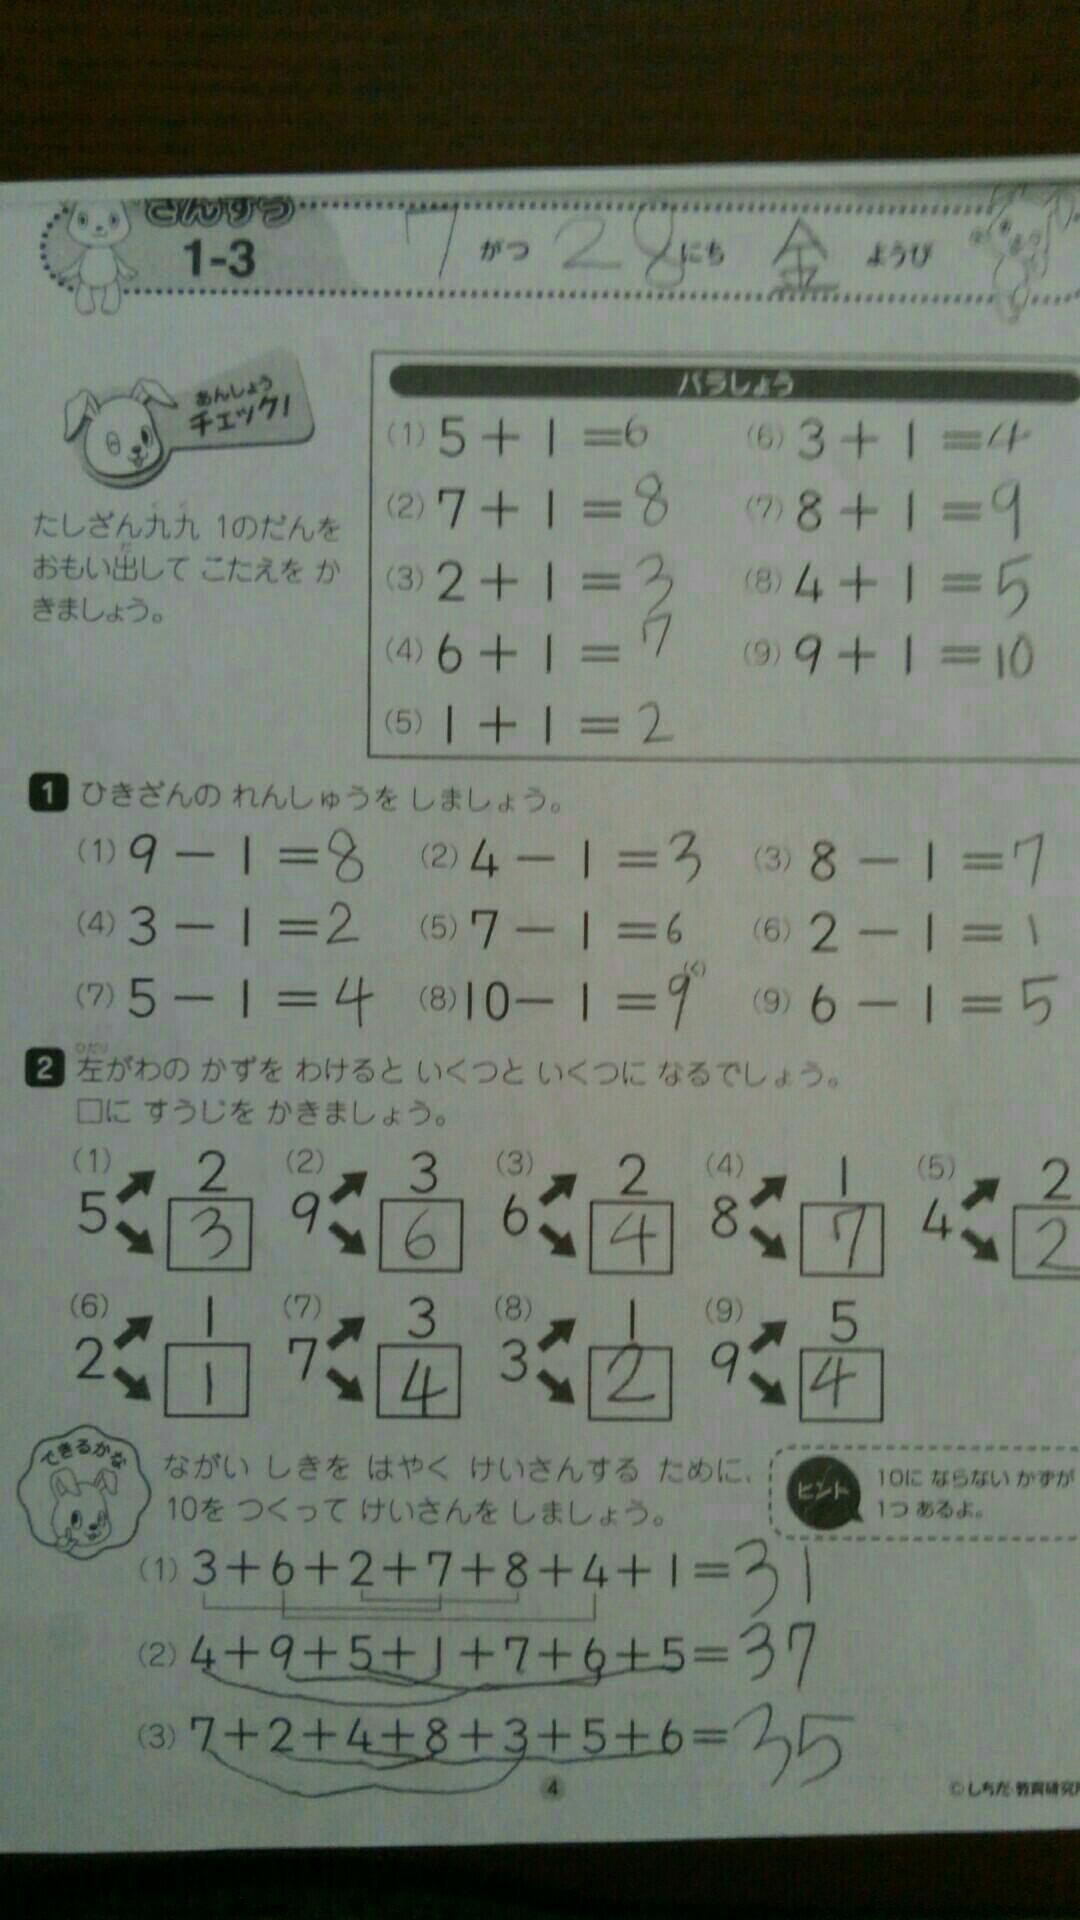 f:id:shihomaru:20170805074244j:image